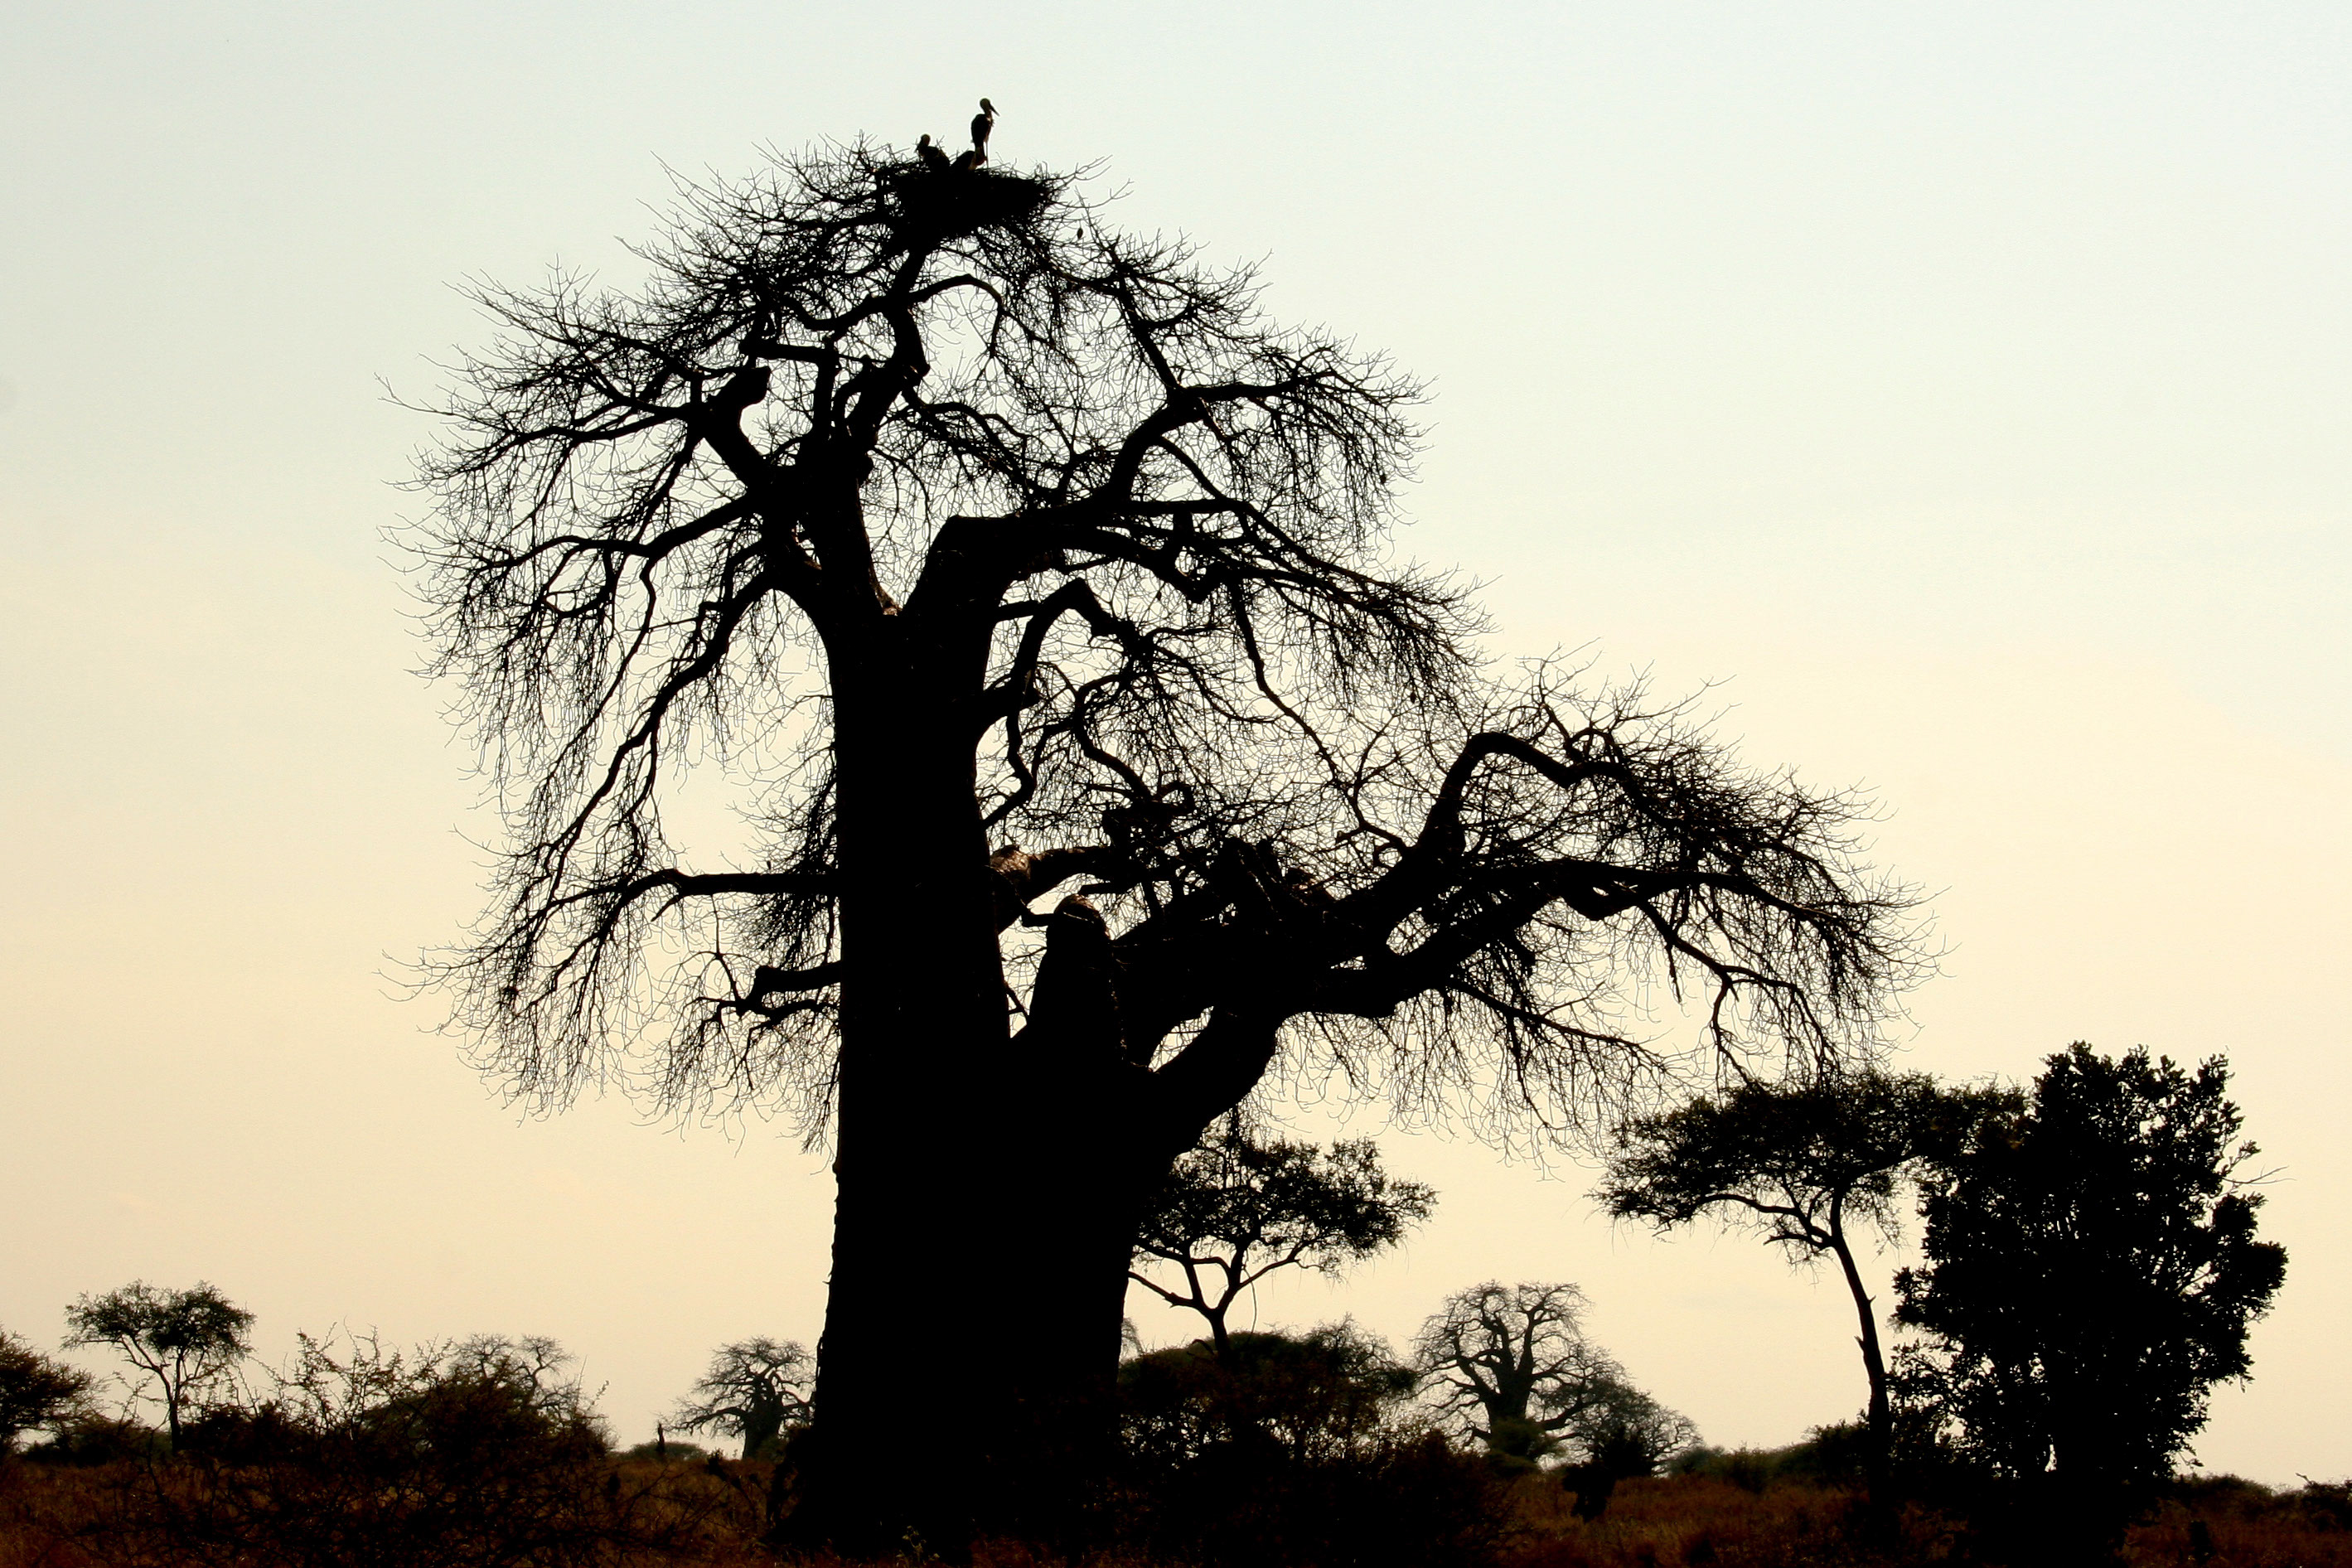 Marabou Storks on Baobab, Tarangire National Park, Tanzania